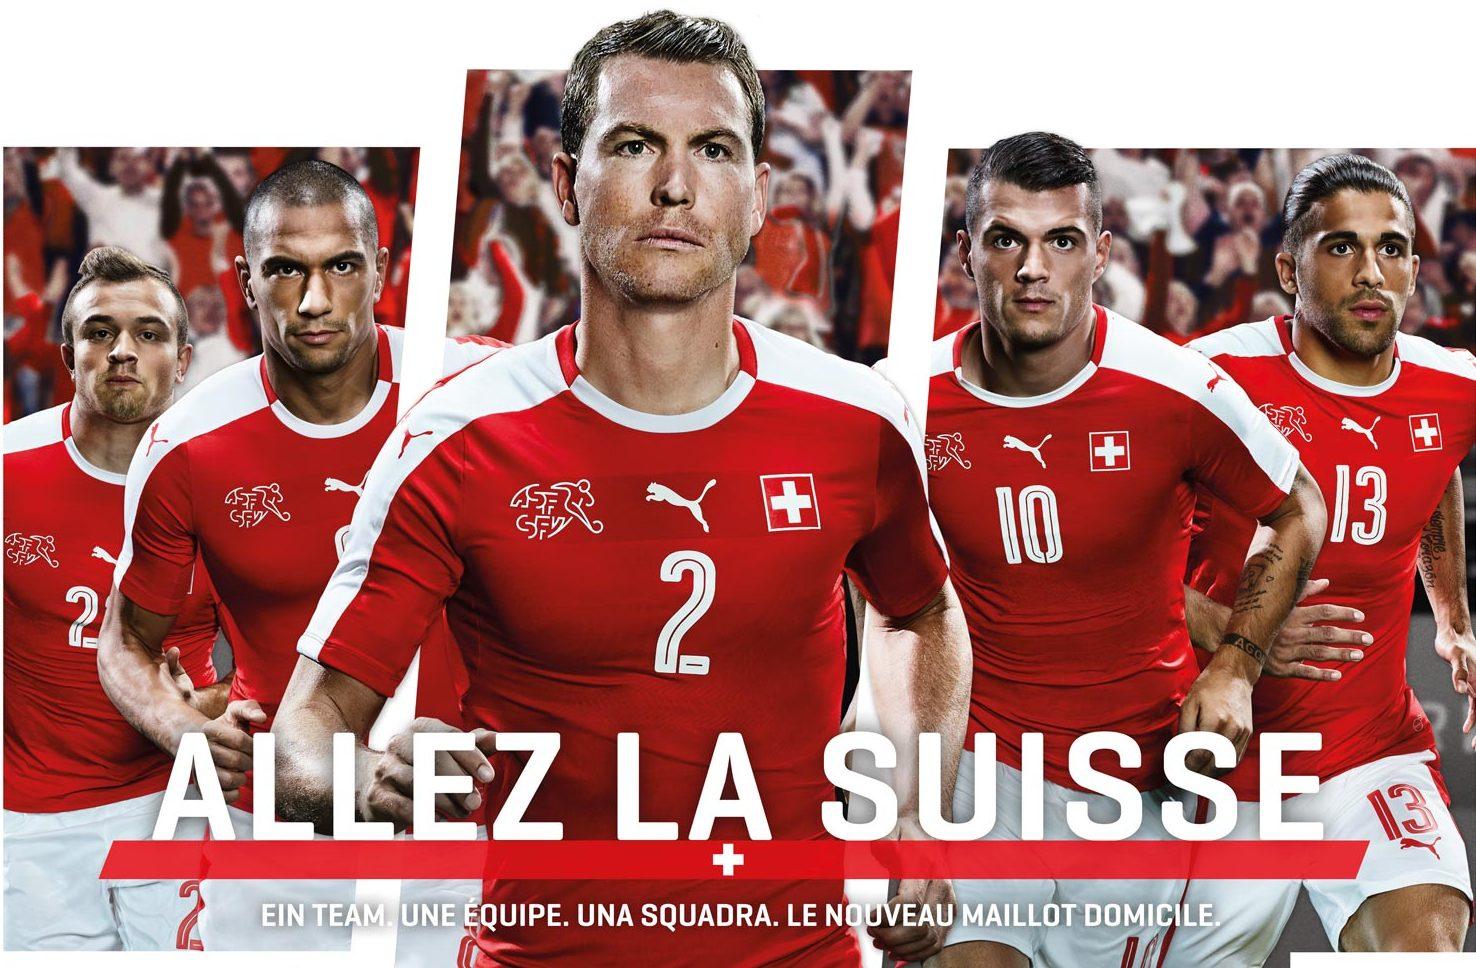 Сборная Швейцария на ЕВРО - 2016